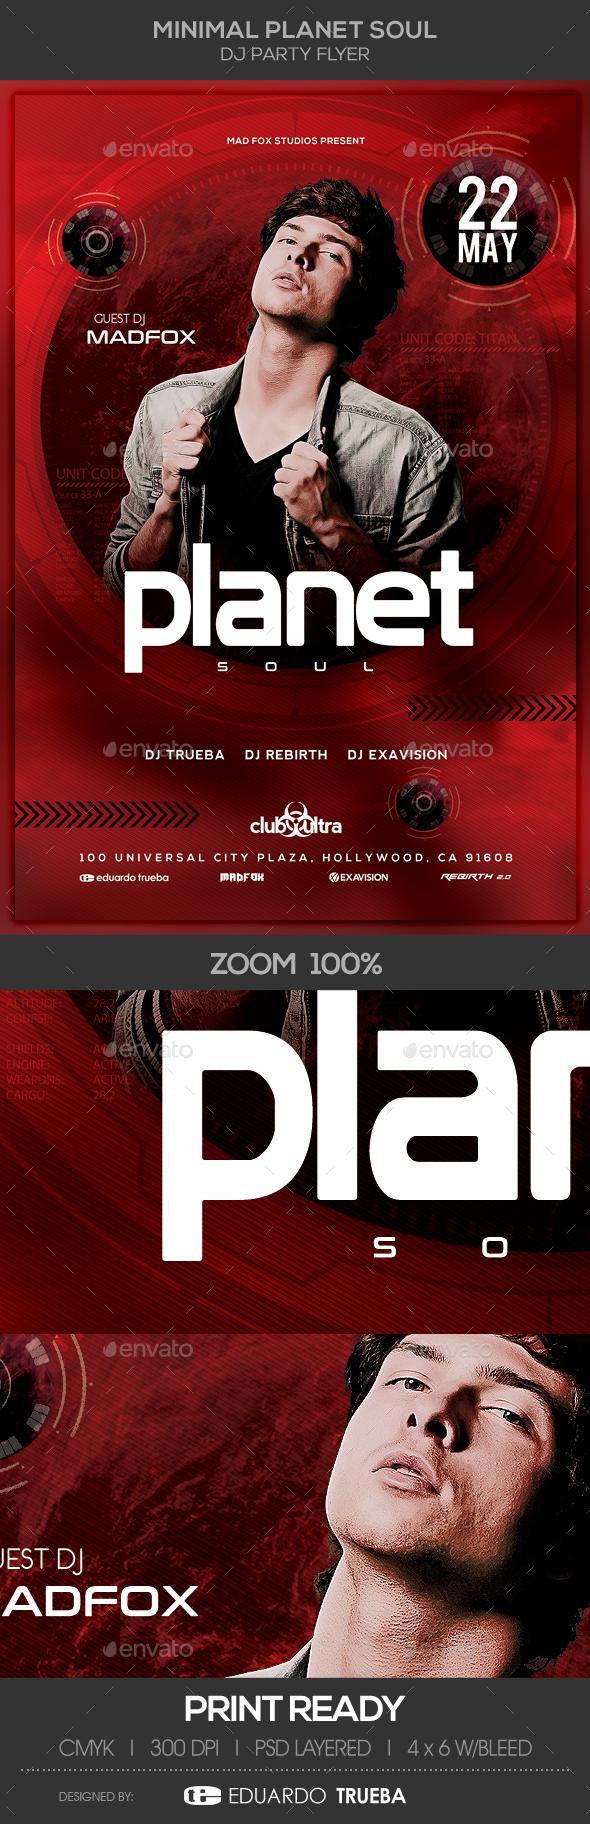 Minimal Planet Soul Dj Party Flyer - Clubs & Parties Events